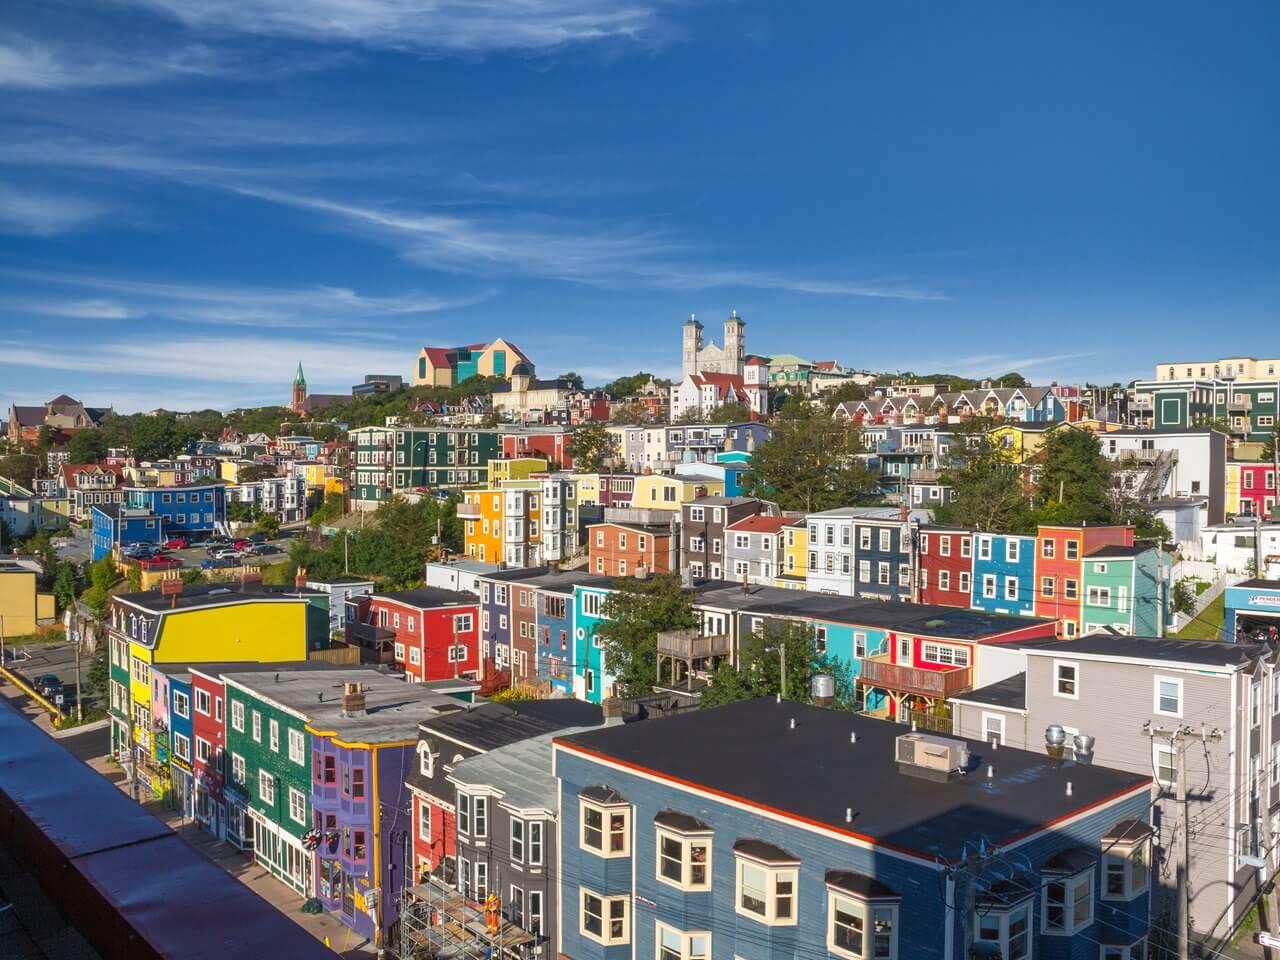 Aerial photograph of St. John's, Newfoundland